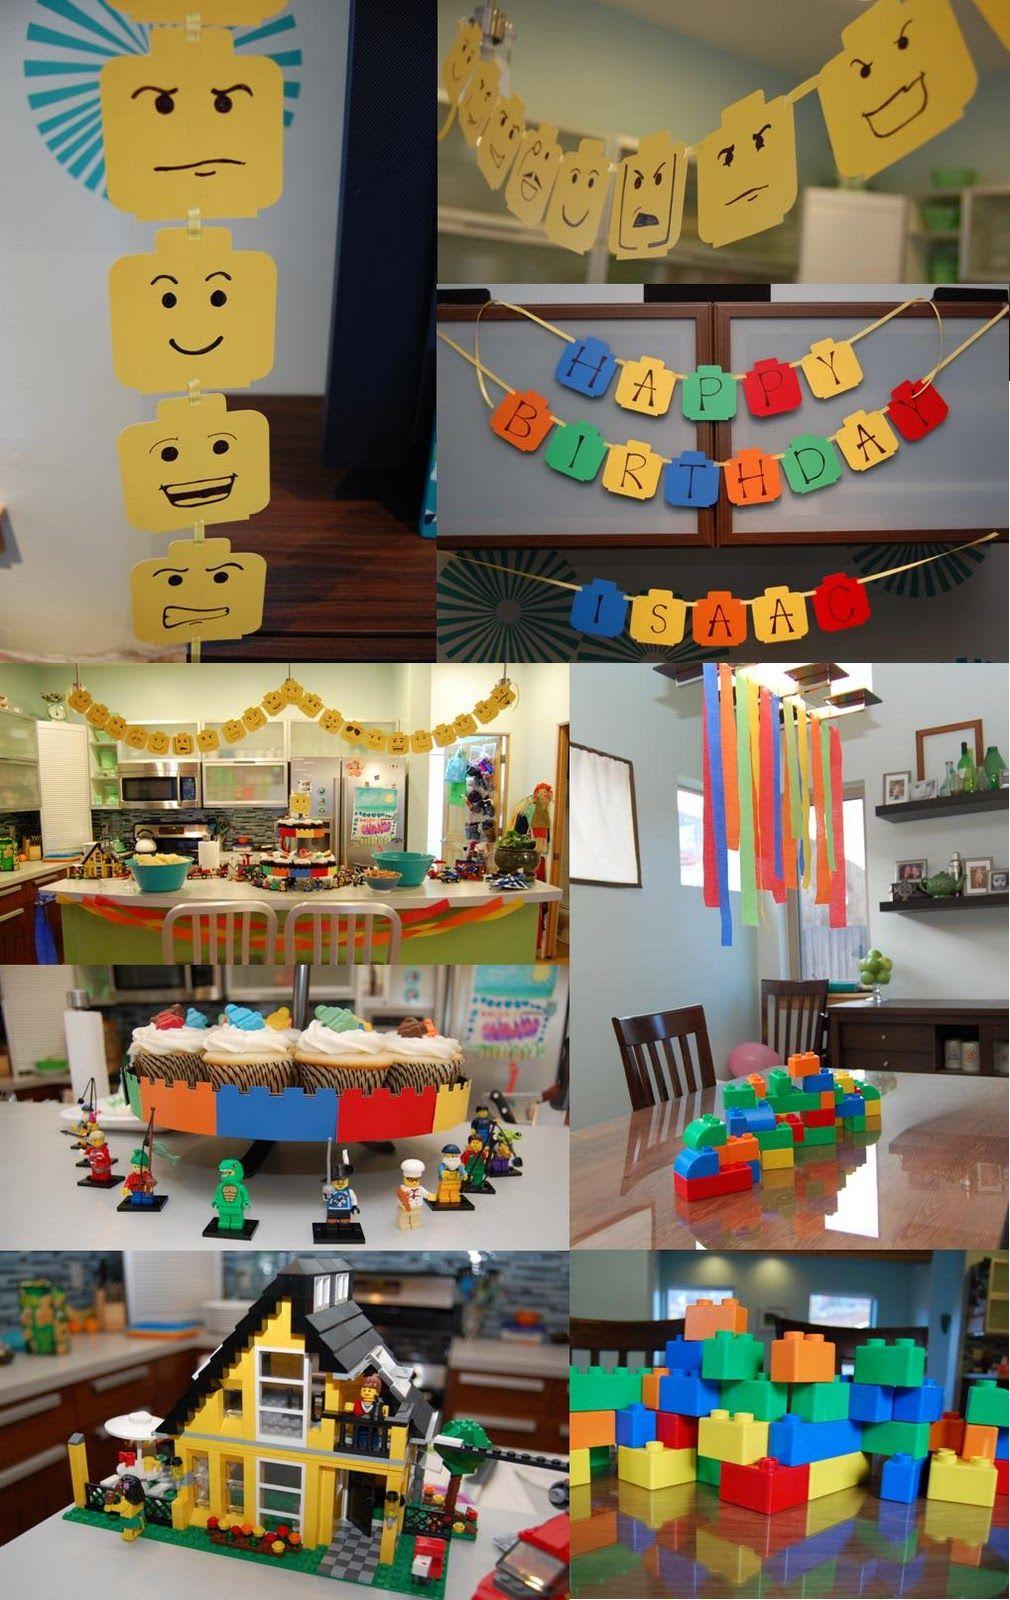 Lego Birthday Party Lego party, Lego birthday, Lego